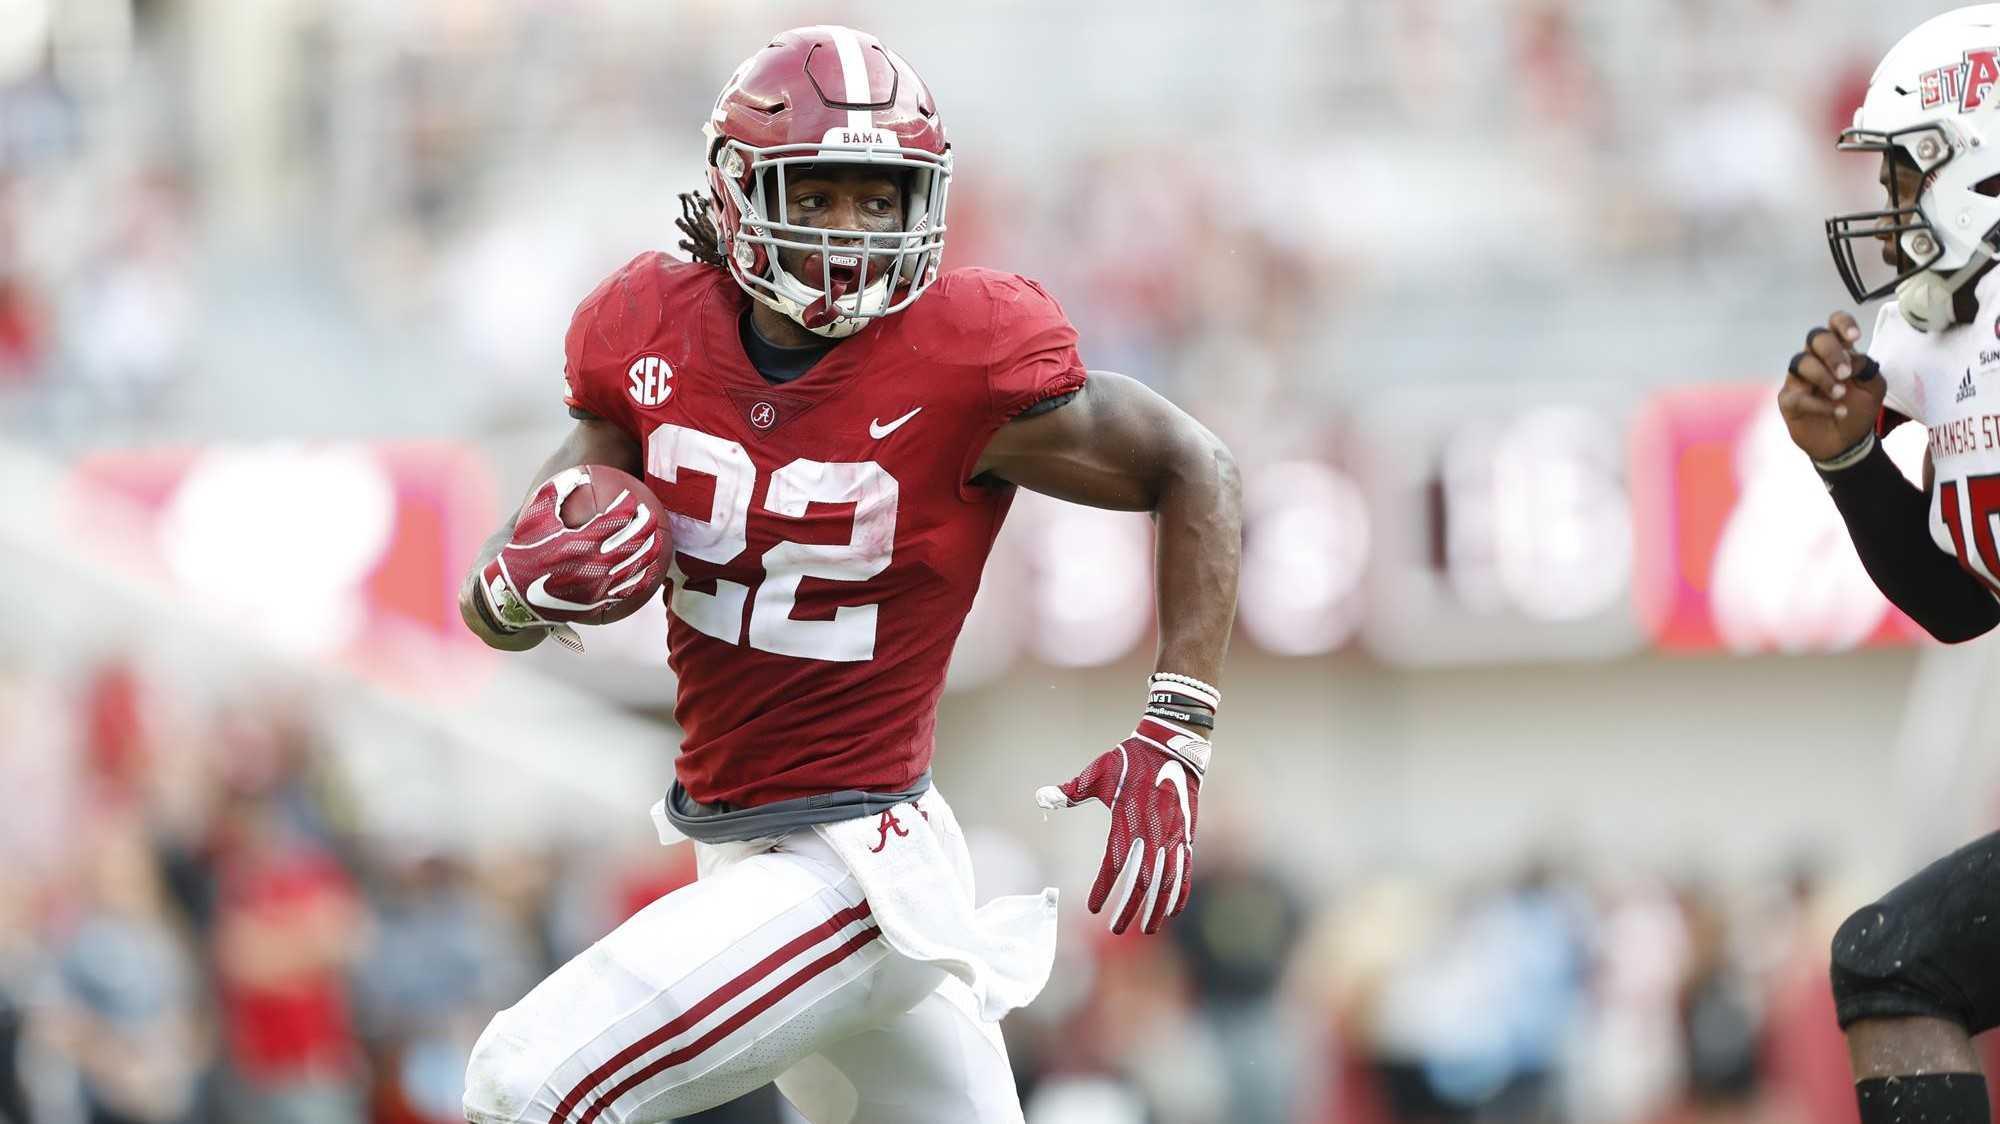 Top Five 2021 NFL Draft Running backs